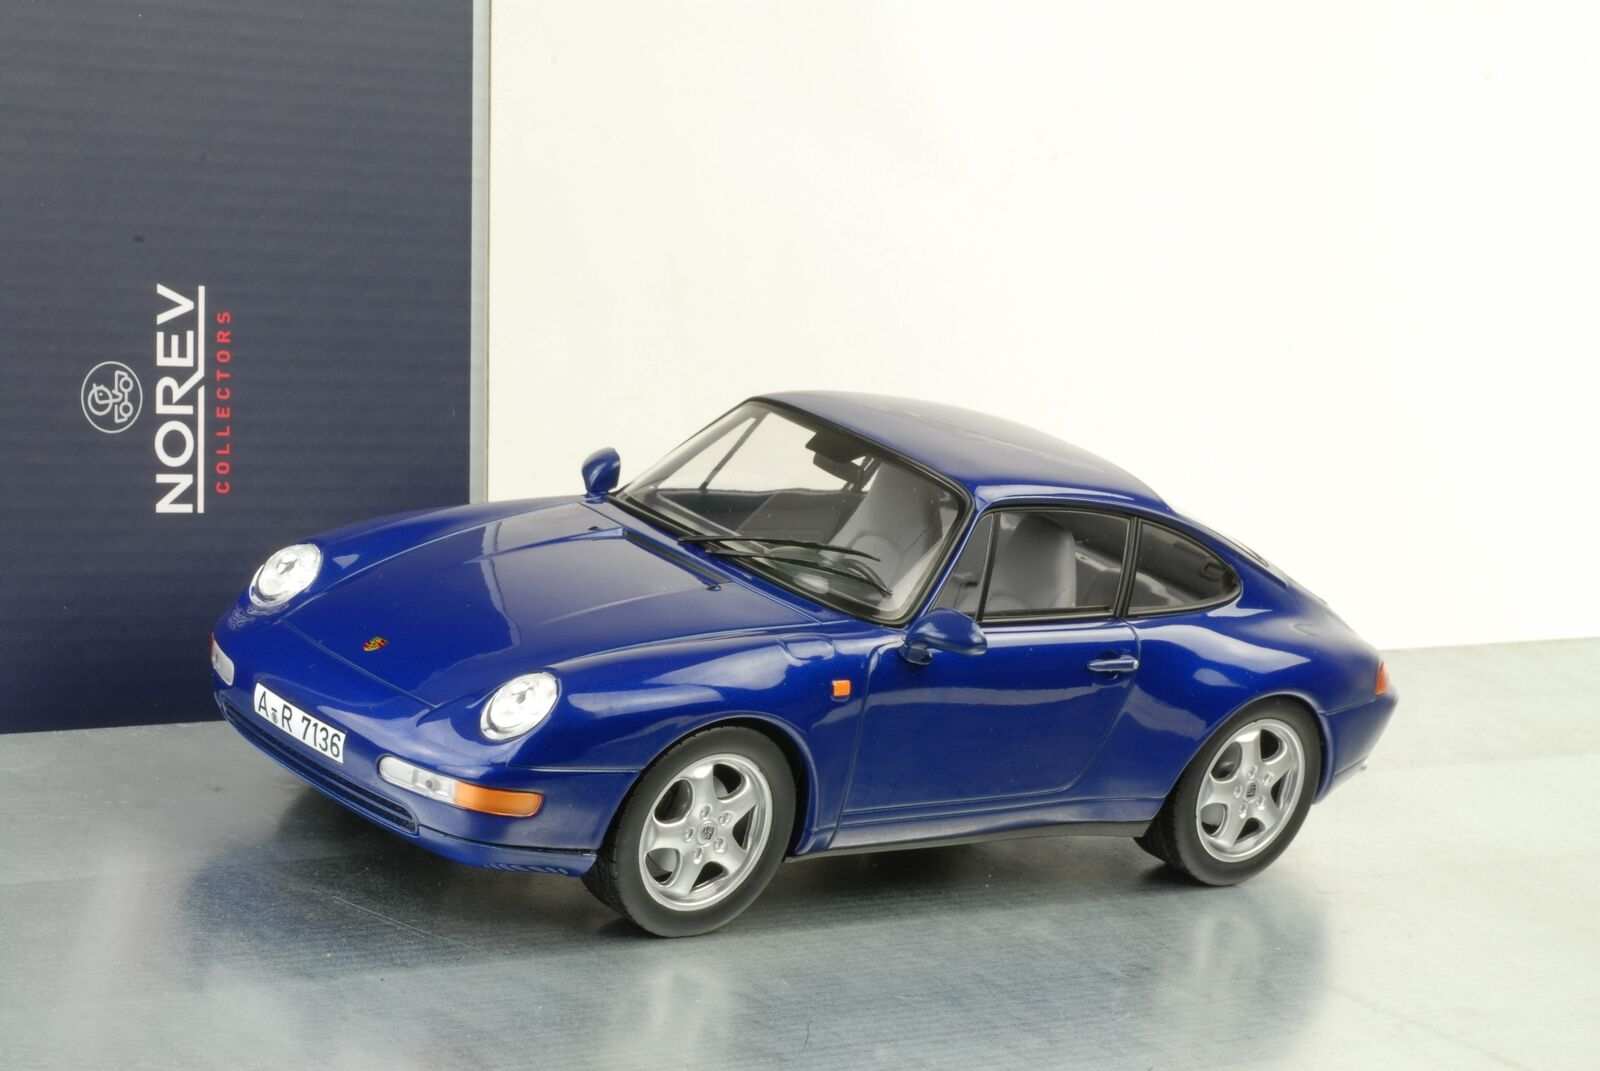 1995 Porsche 911 993 coupé bleu métallisé 1 18 18 18 Norev 187593 f4aa52